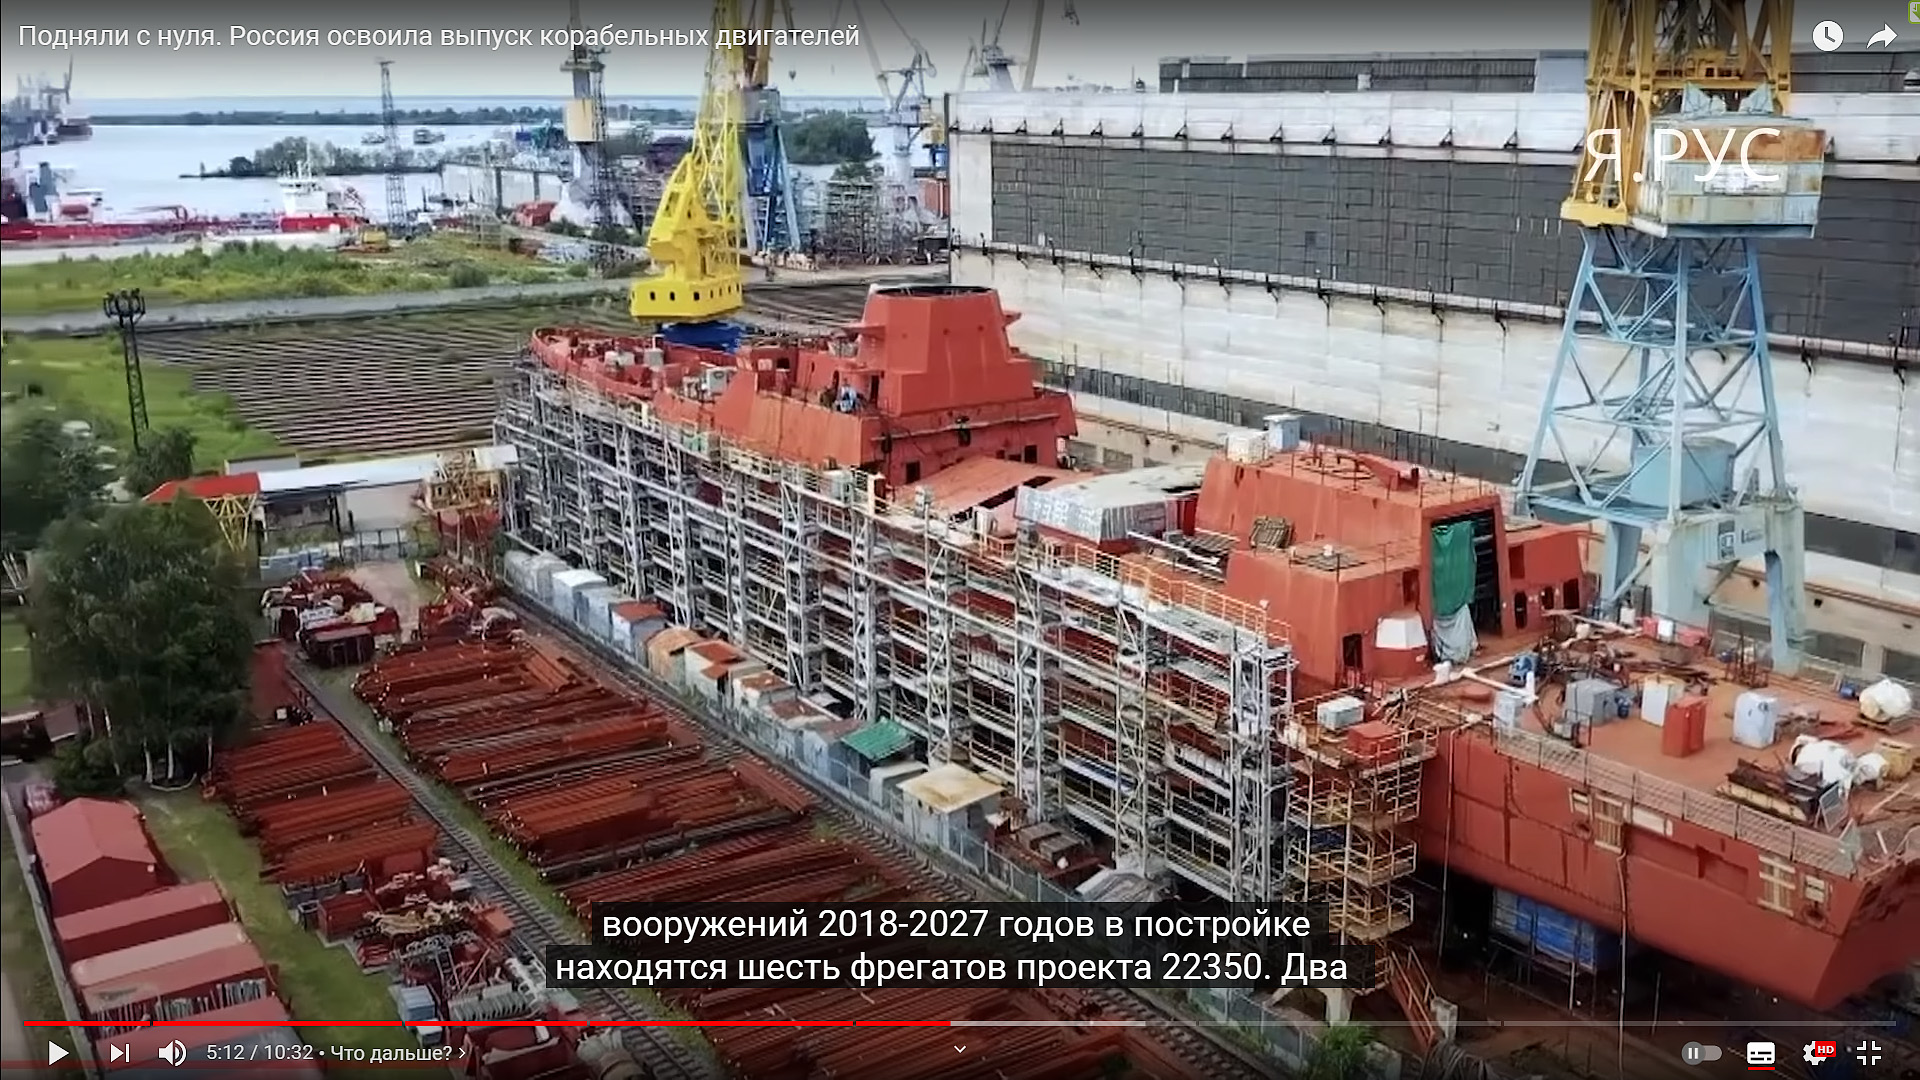 Project 22350: Admiral Sergei Gorshkov #2 - Page 36 28-99011